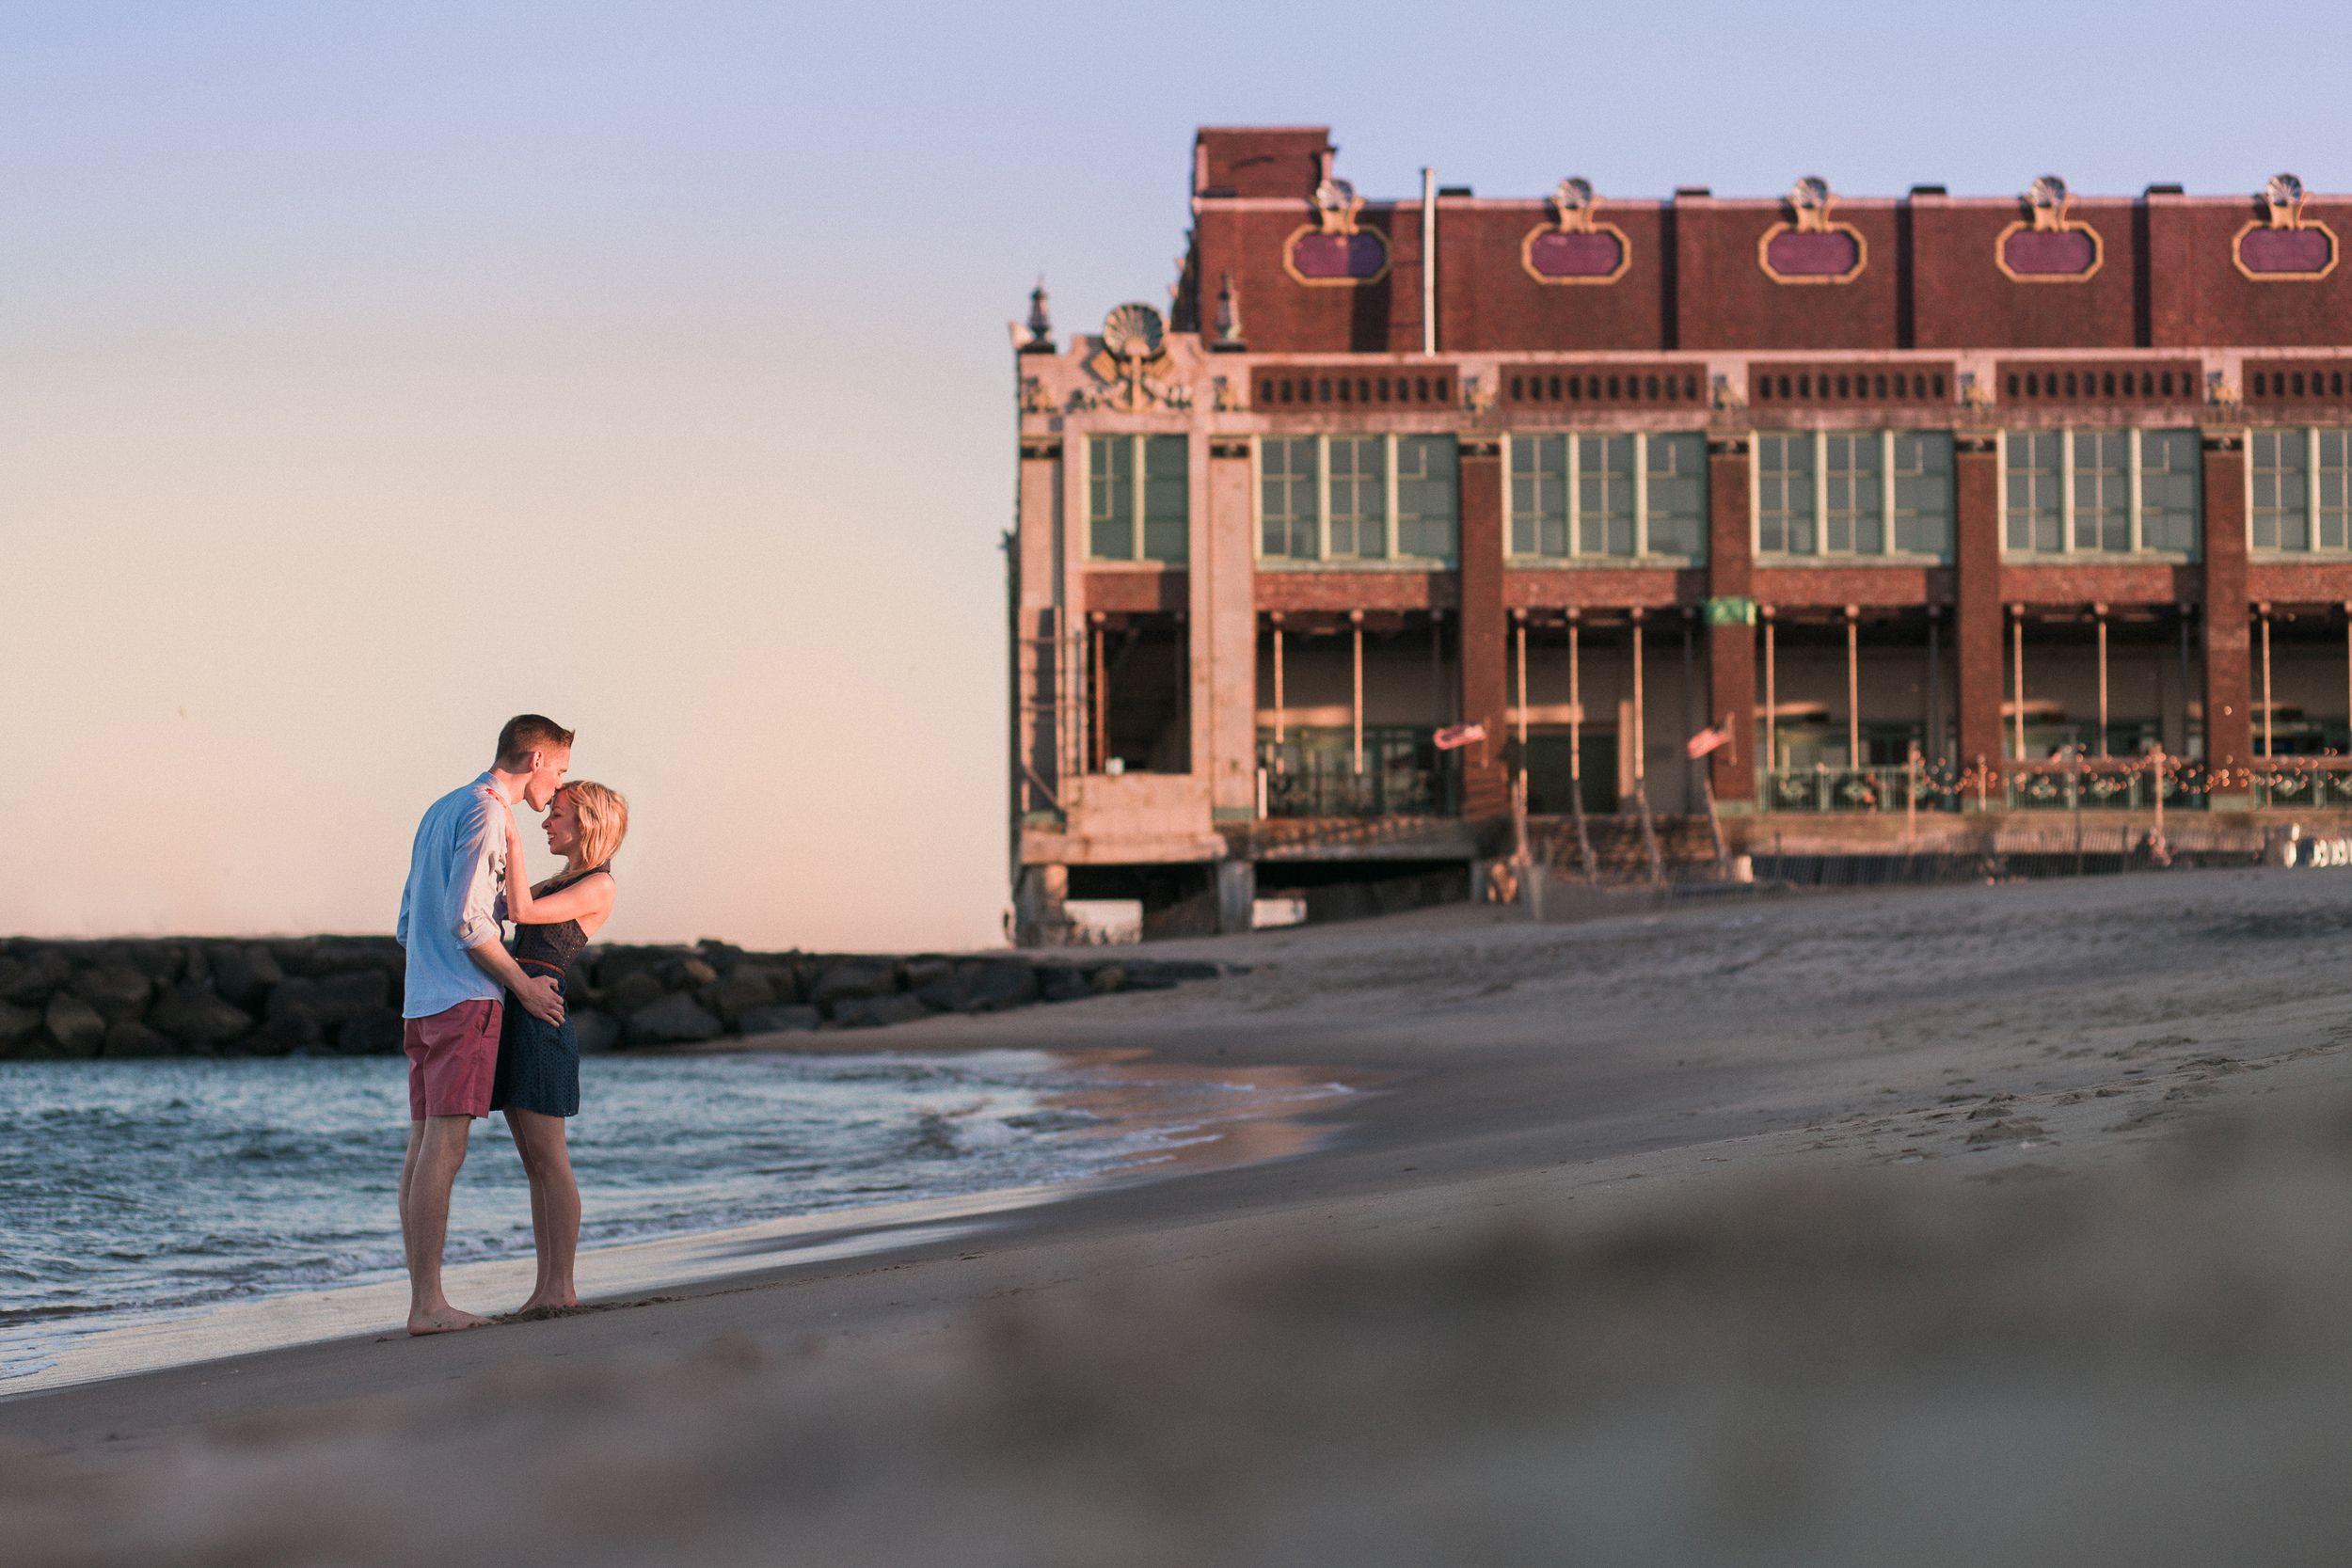 Asbury Park Beach at Sunset Engagement Photo